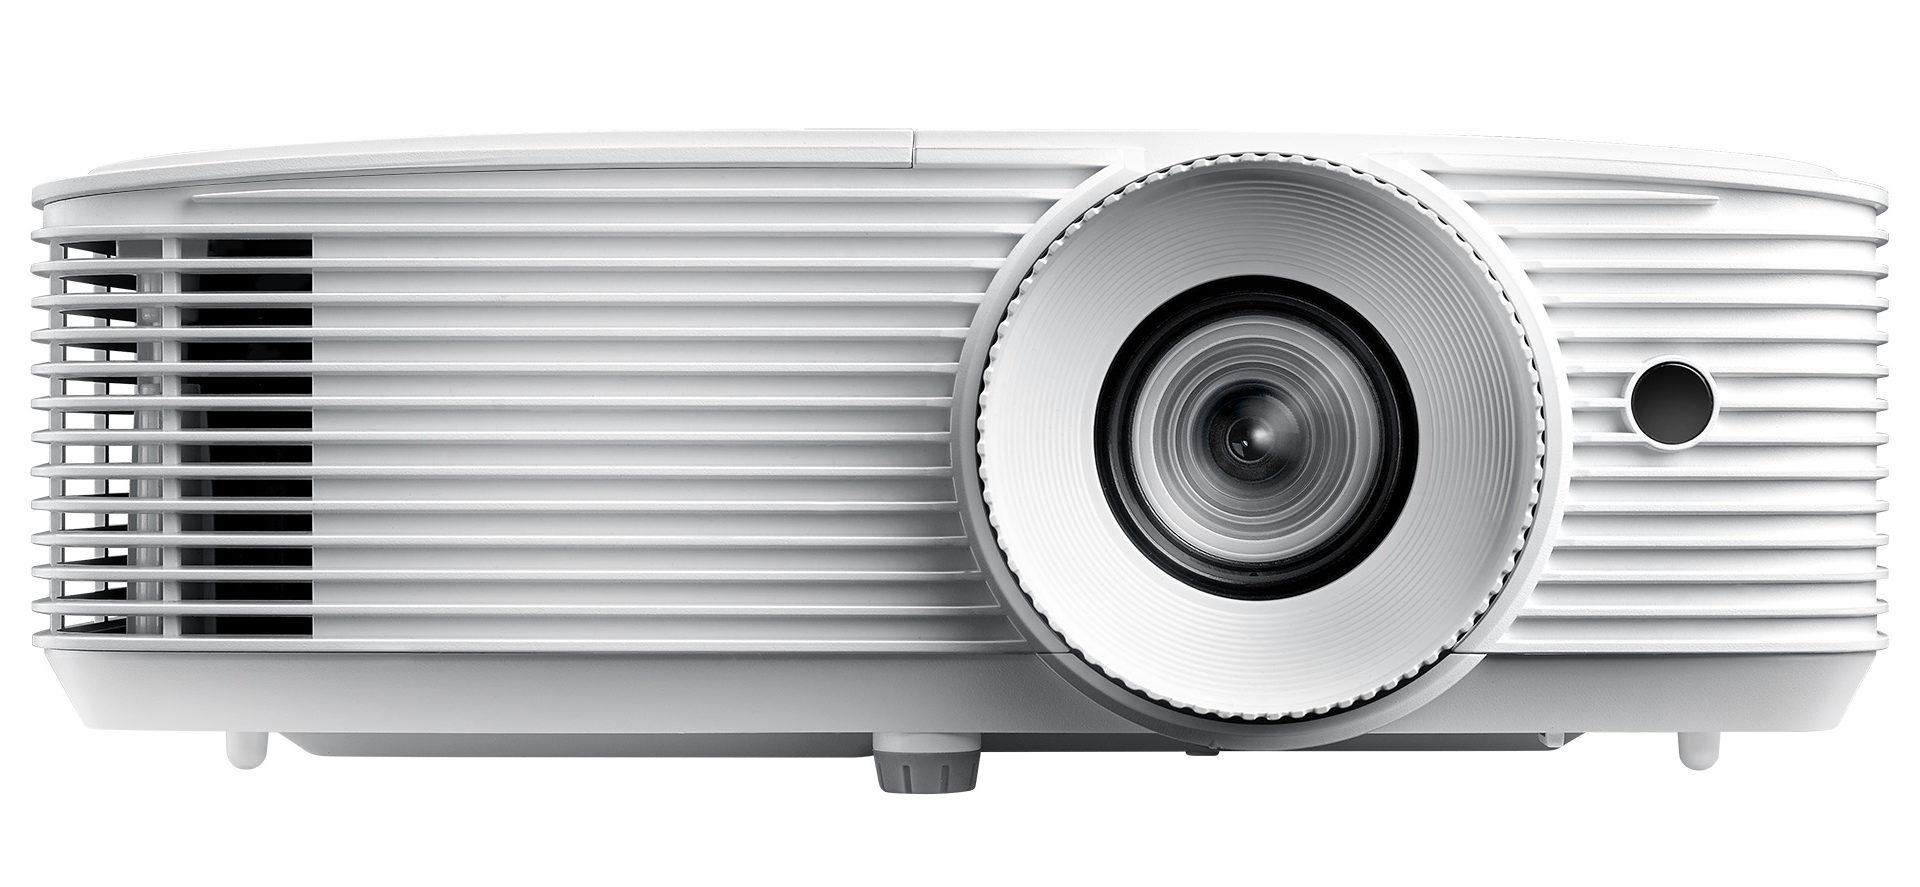 Фото - Проектор Optoma EH335 White DLP / 1920 x 1080 / 16:9 / 3600 Lm / 20000:1 кеды мужские vans ua sk8 mid цвет белый va3wm3vp3 размер 9 5 43